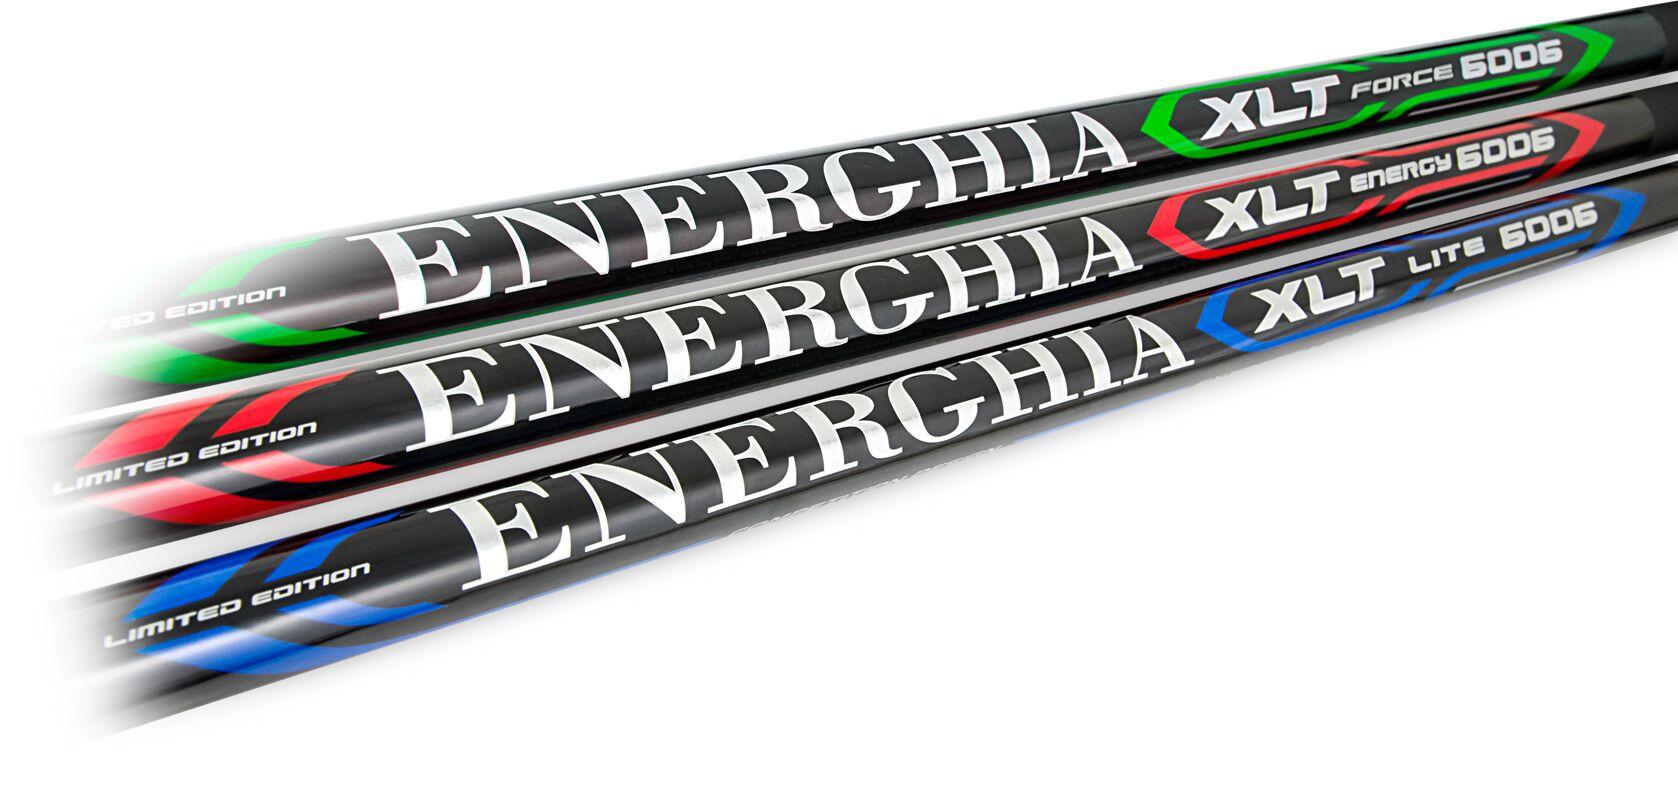 TRABUCCO - Energhia XLT Energy Bolo